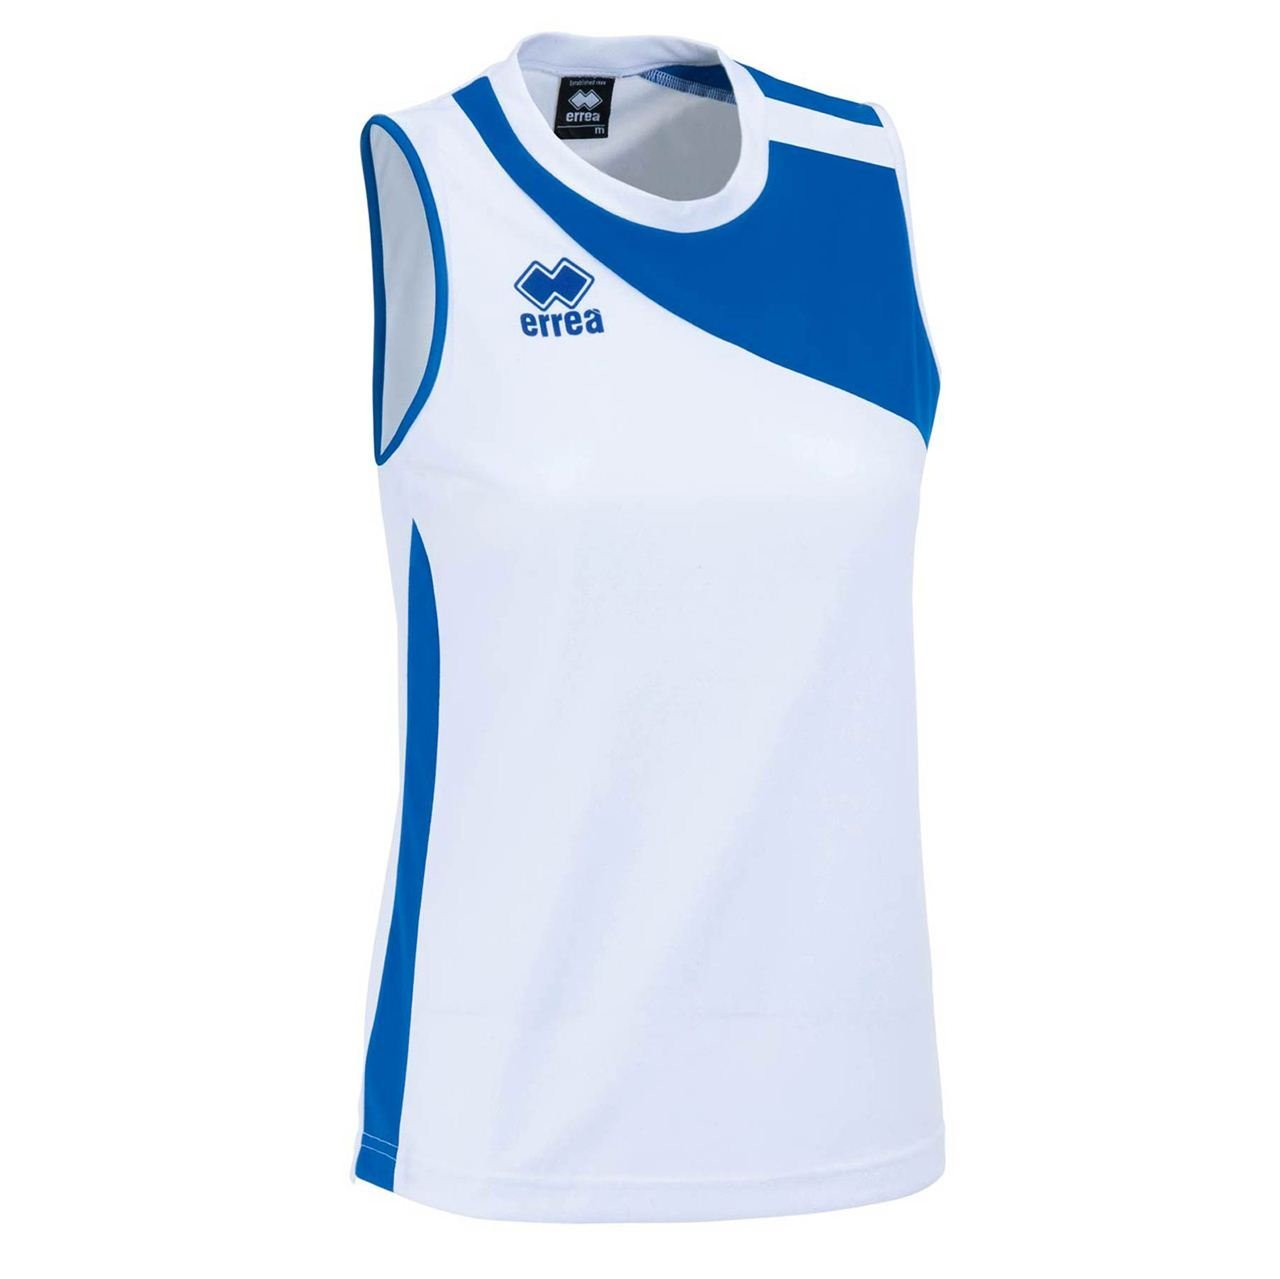 Errea Amazon MG Donna,Bianco/Azzurro Size XL